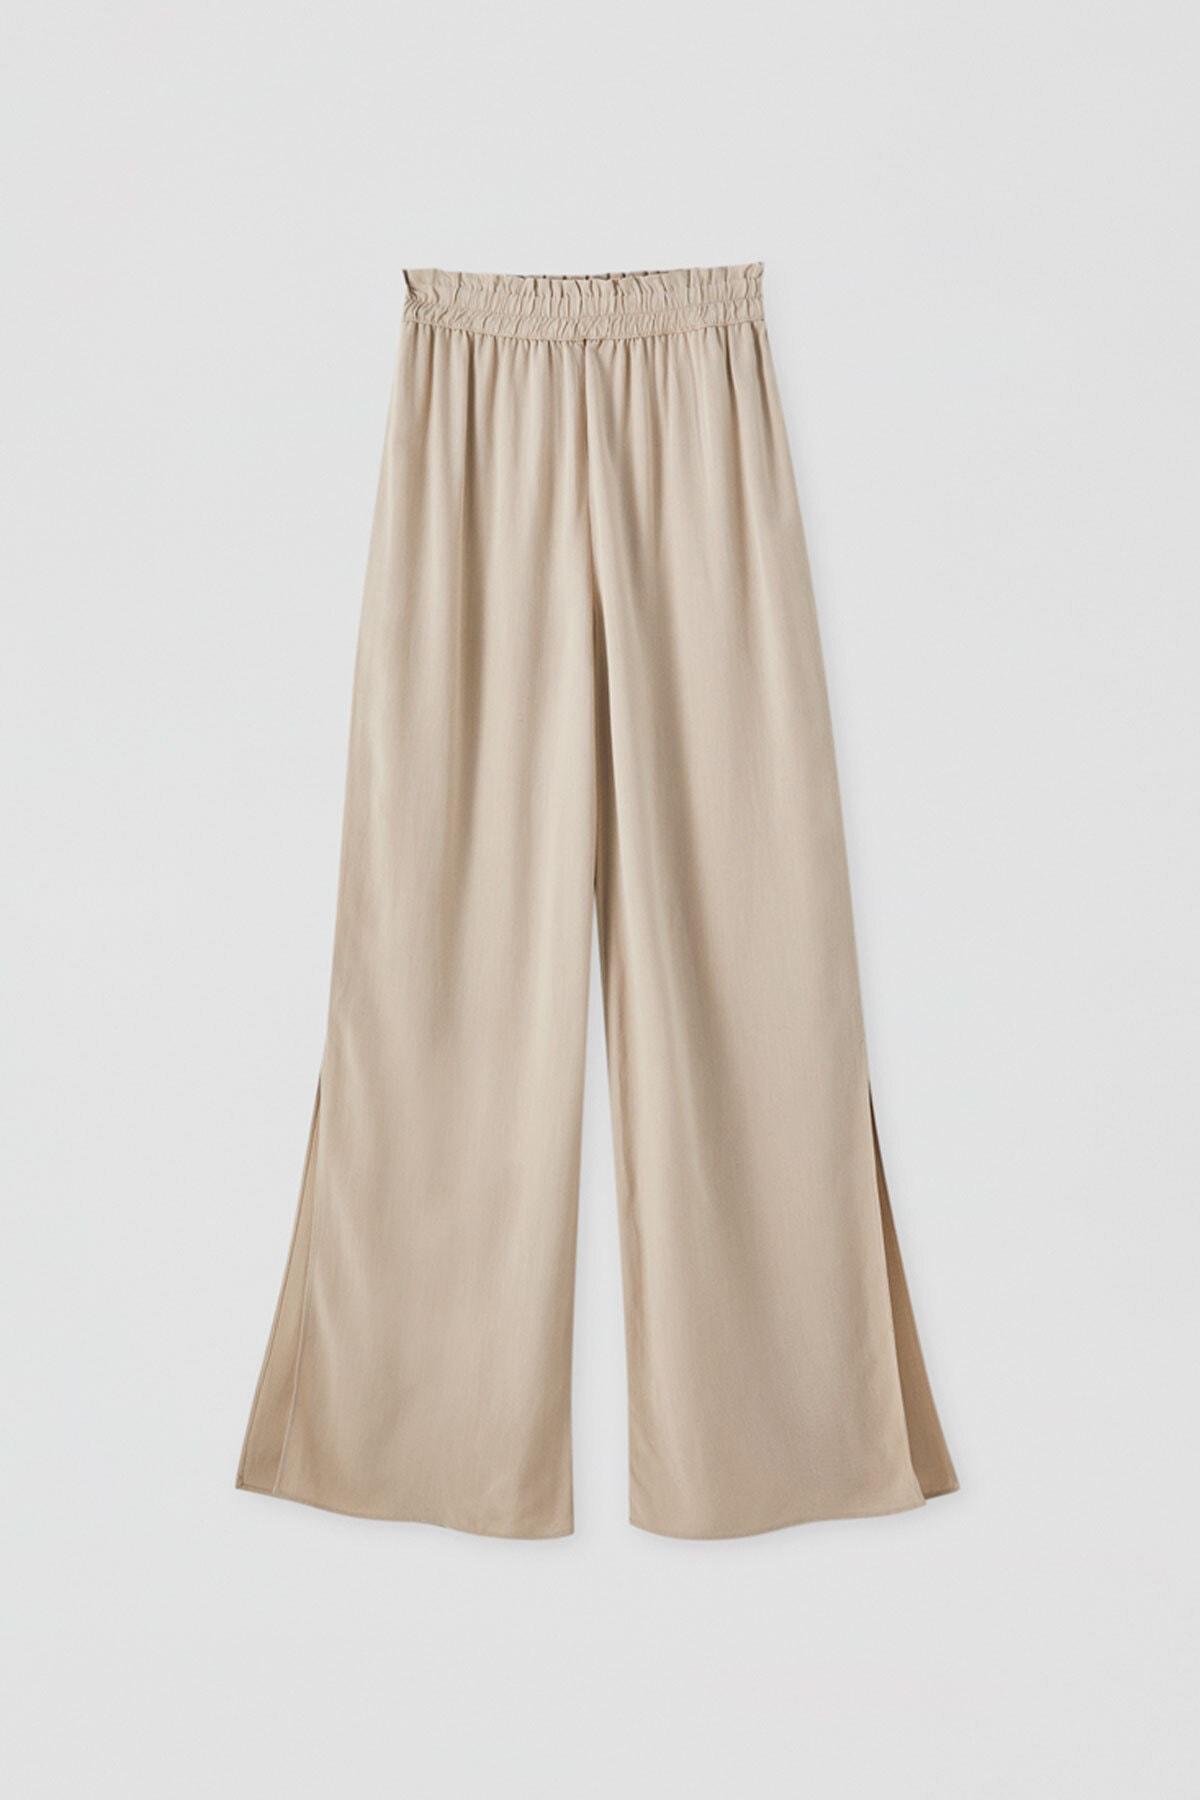 Pull & Bear Kadın Kum Rengi Elastik Belli Keten Pantolon 05671307 1